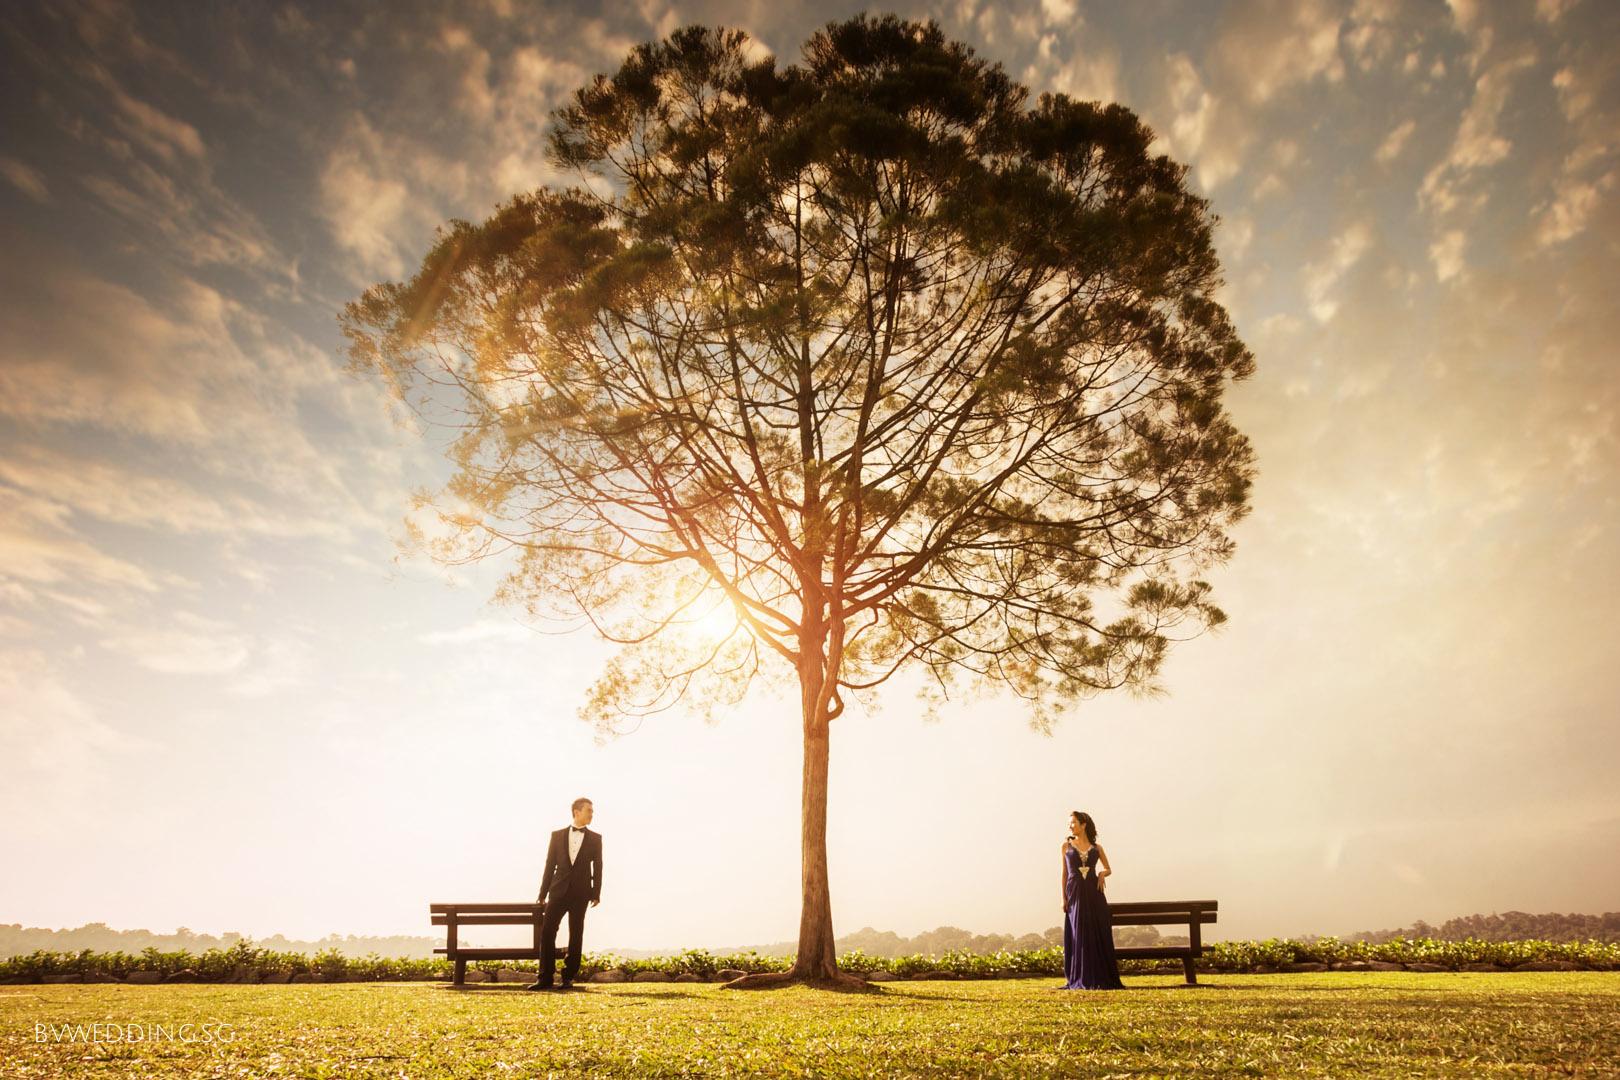 Pre-wedding Photoshoot at Upper Seletar